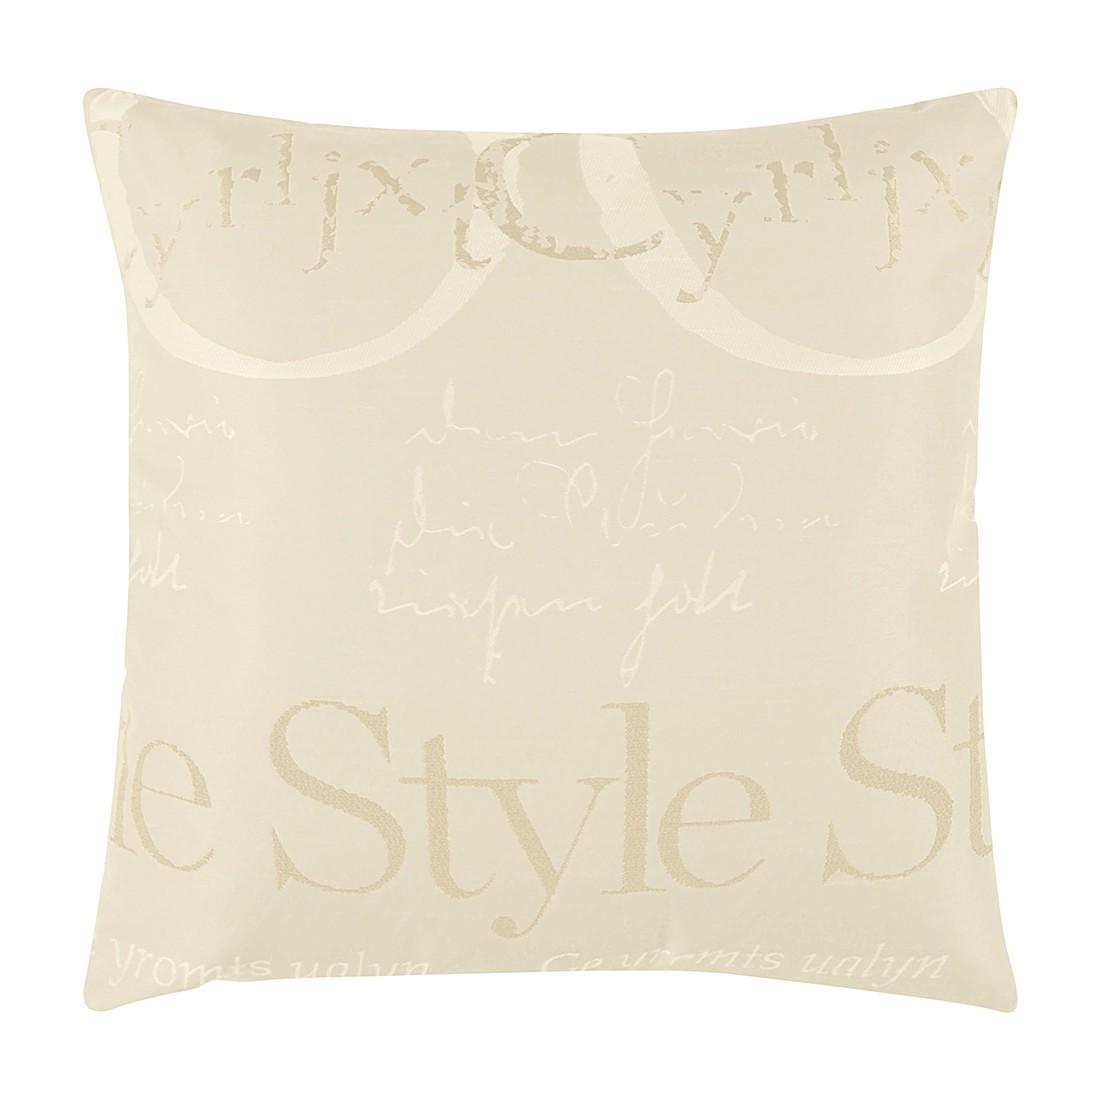 Kissenhülle Style – Beige, Apelt online kaufen